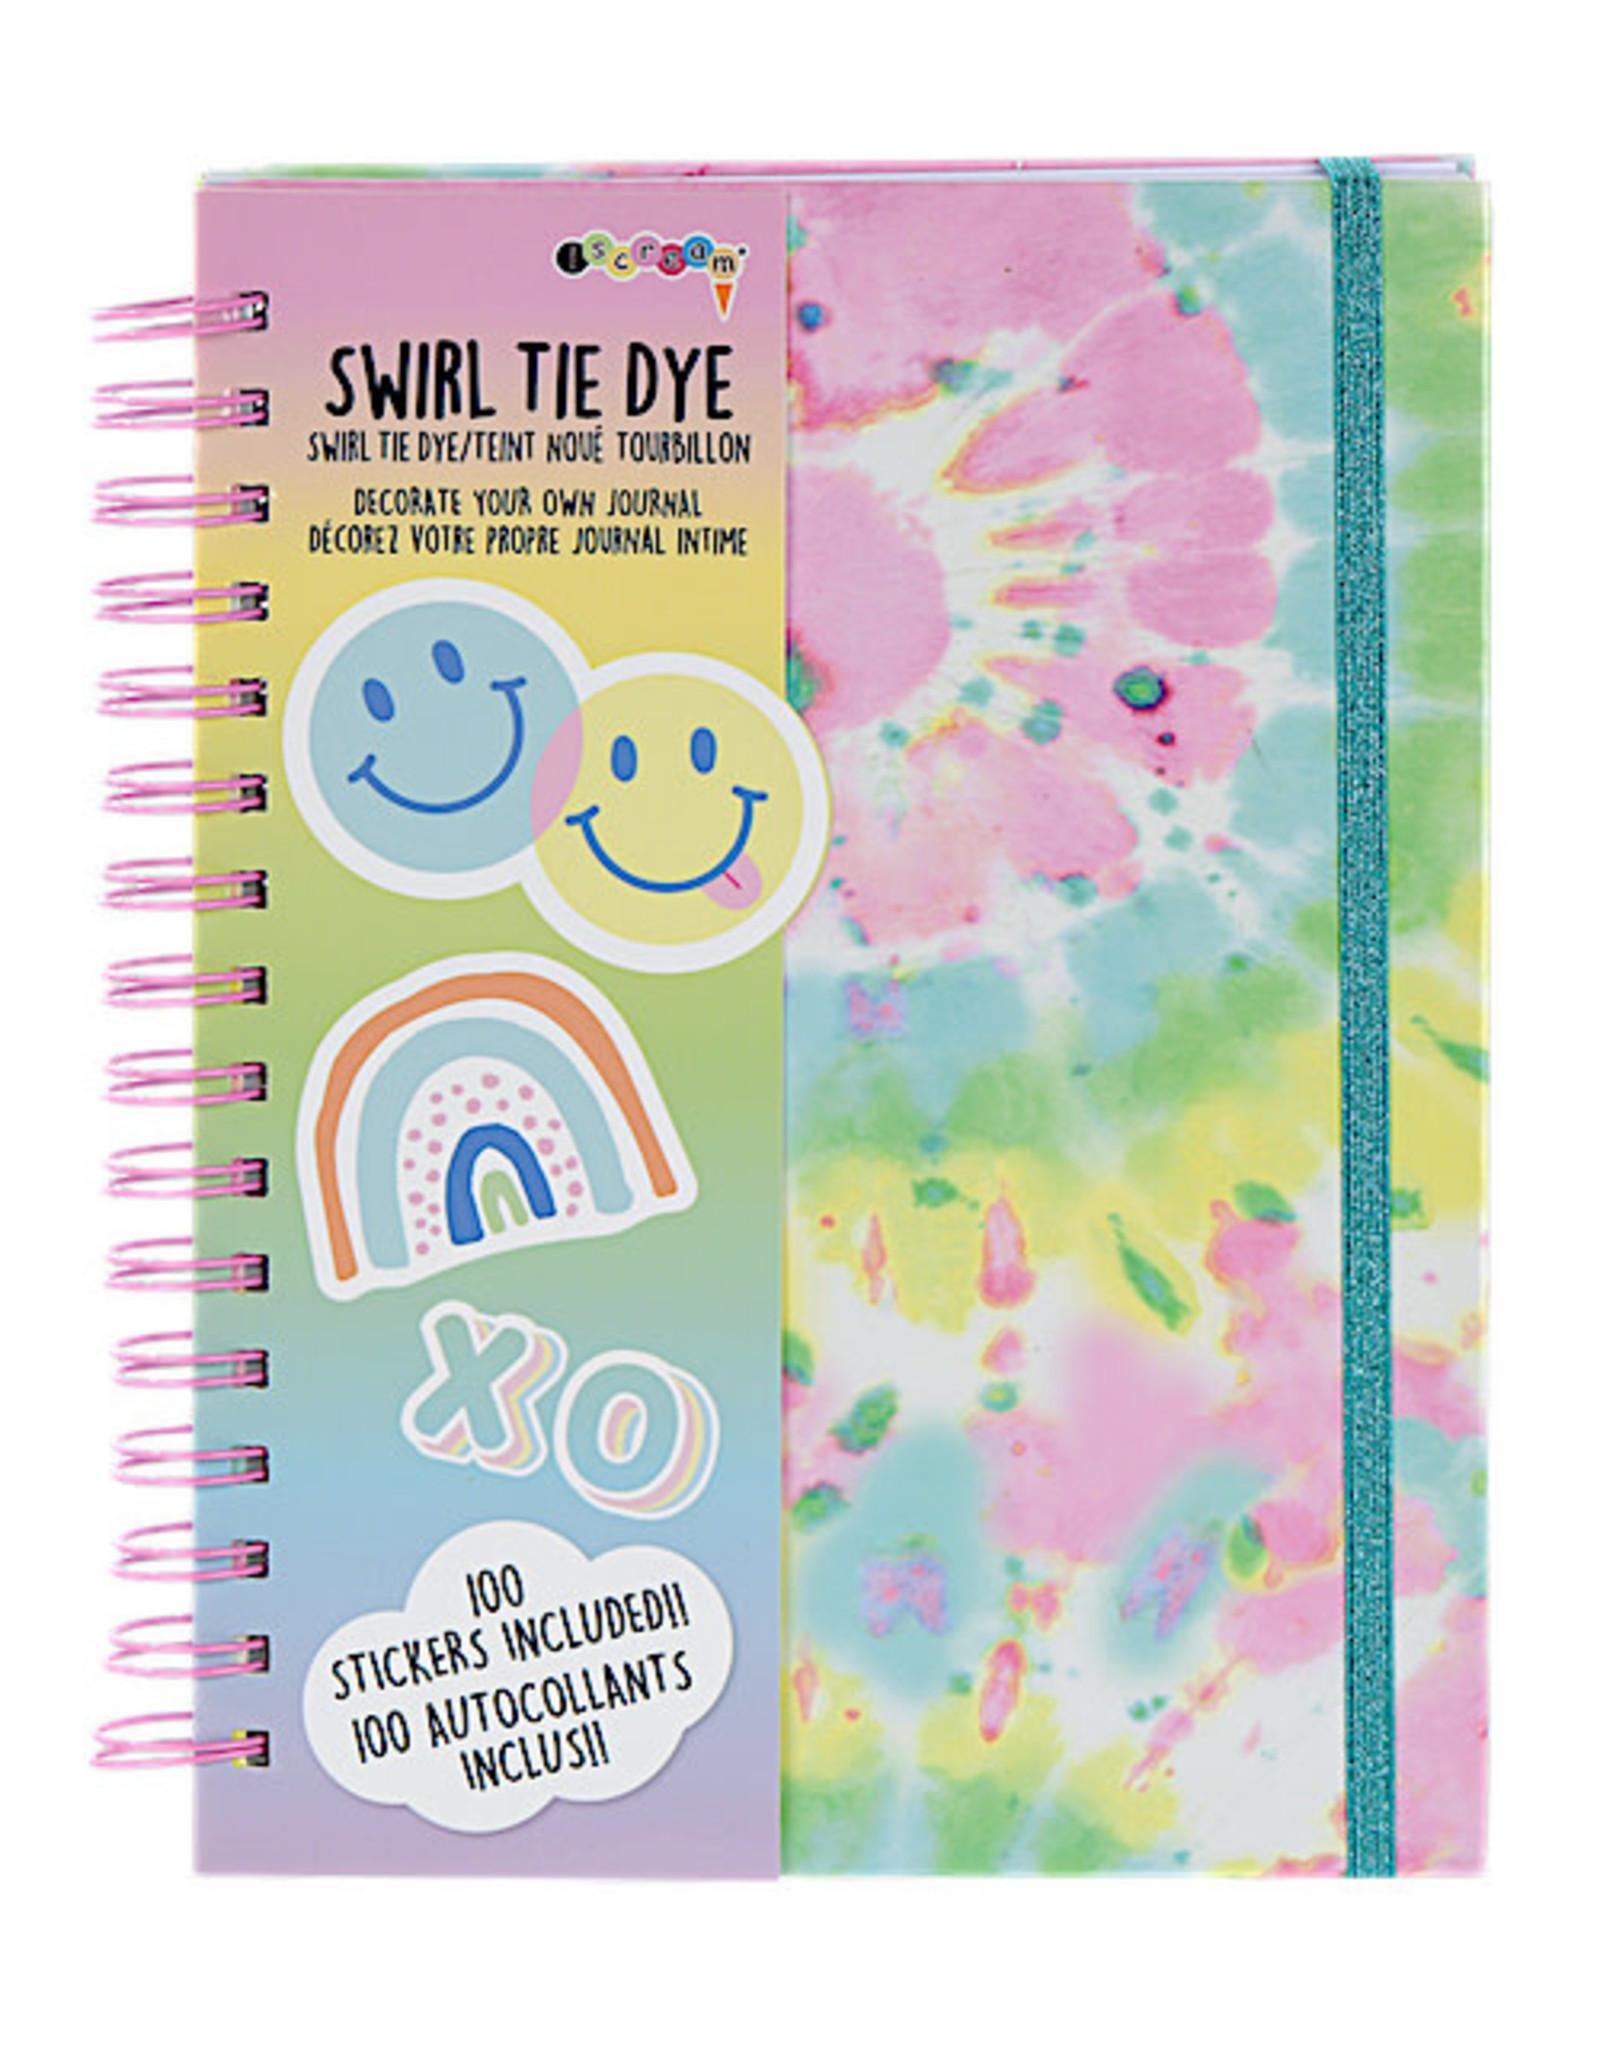 Iscream Swirl Tie Dye Journal W/Stickers